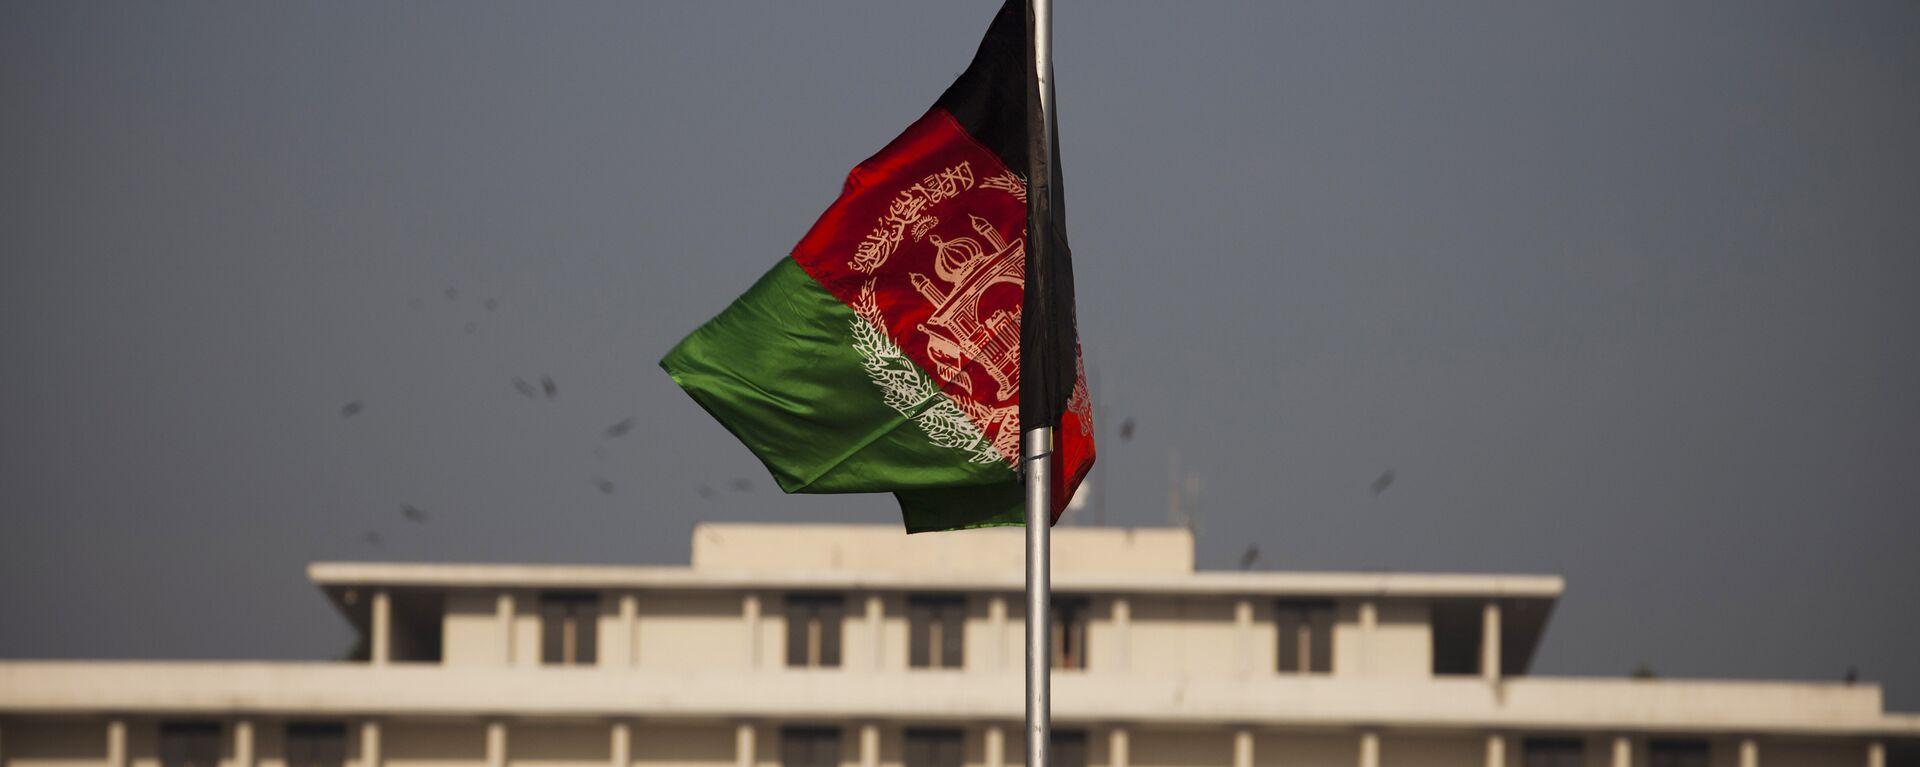 Bandera de Afganistán - Sputnik Mundo, 1920, 27.02.2021